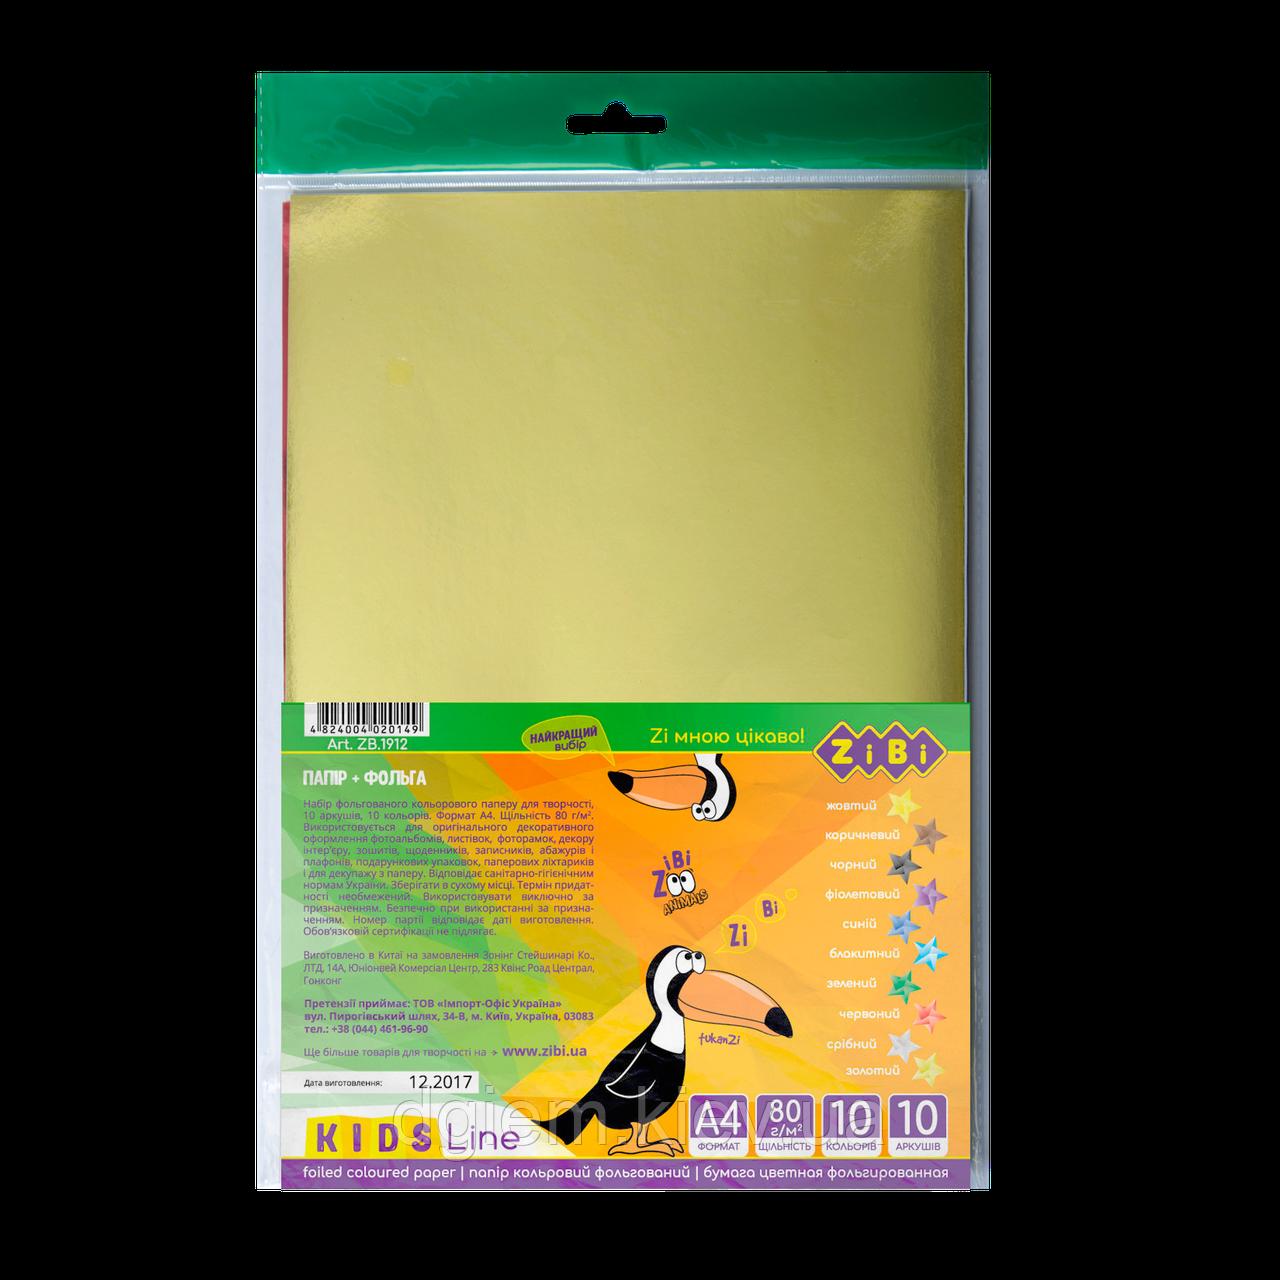 Набір кольоровий фольгованого паперу А4 10л, 10кол.